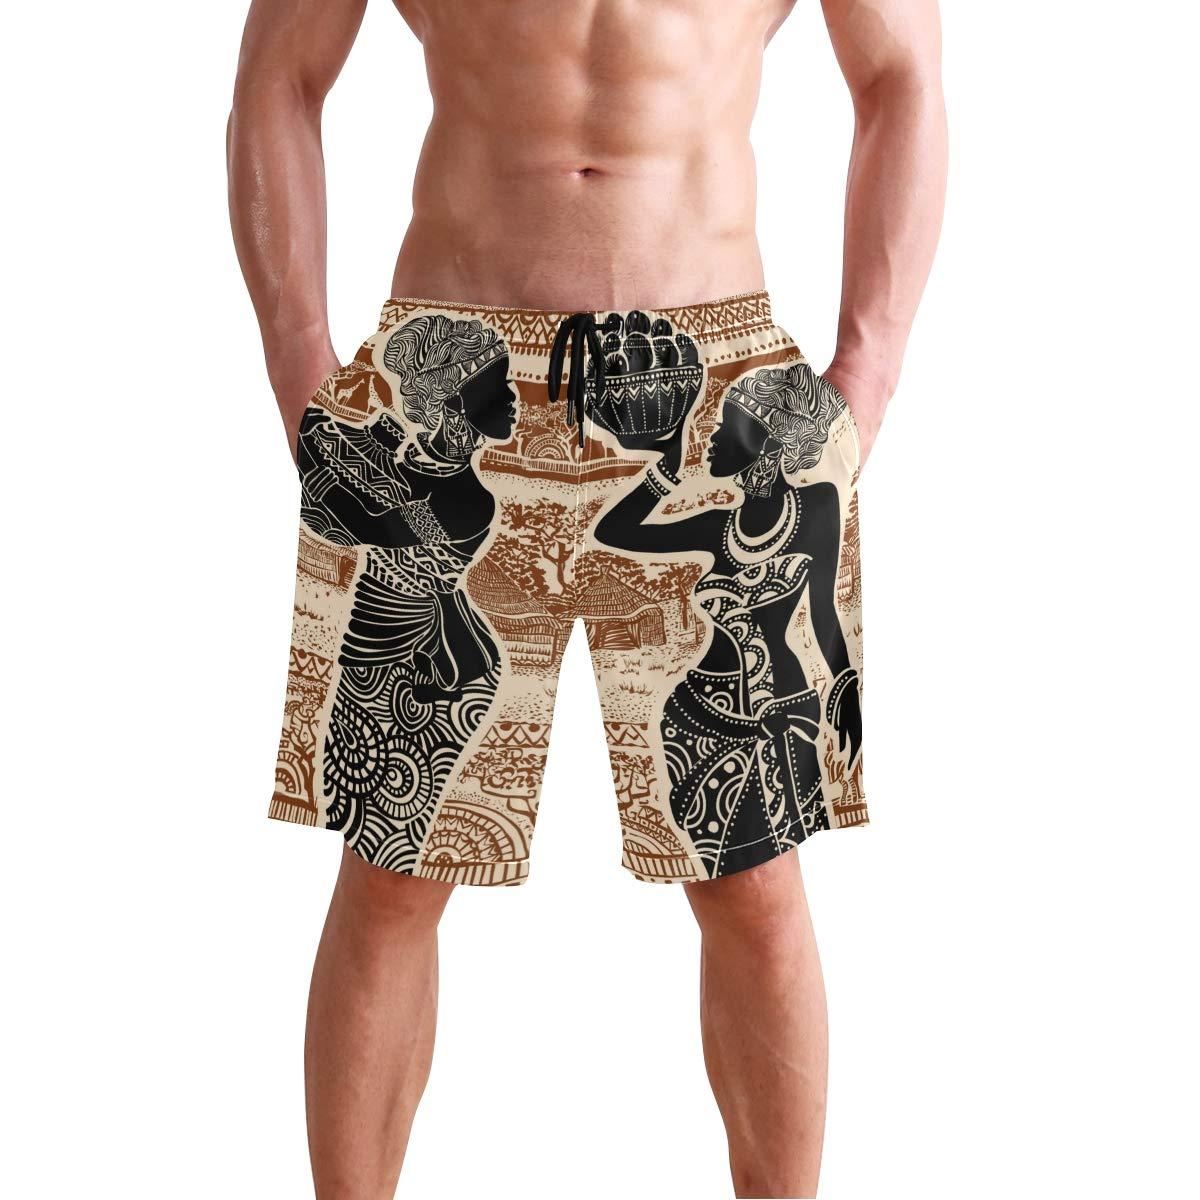 KUWT Mens Swim Trunks Tribal African Women Tree Quick Dry Beach Shorts Summer Surf Board Shorts